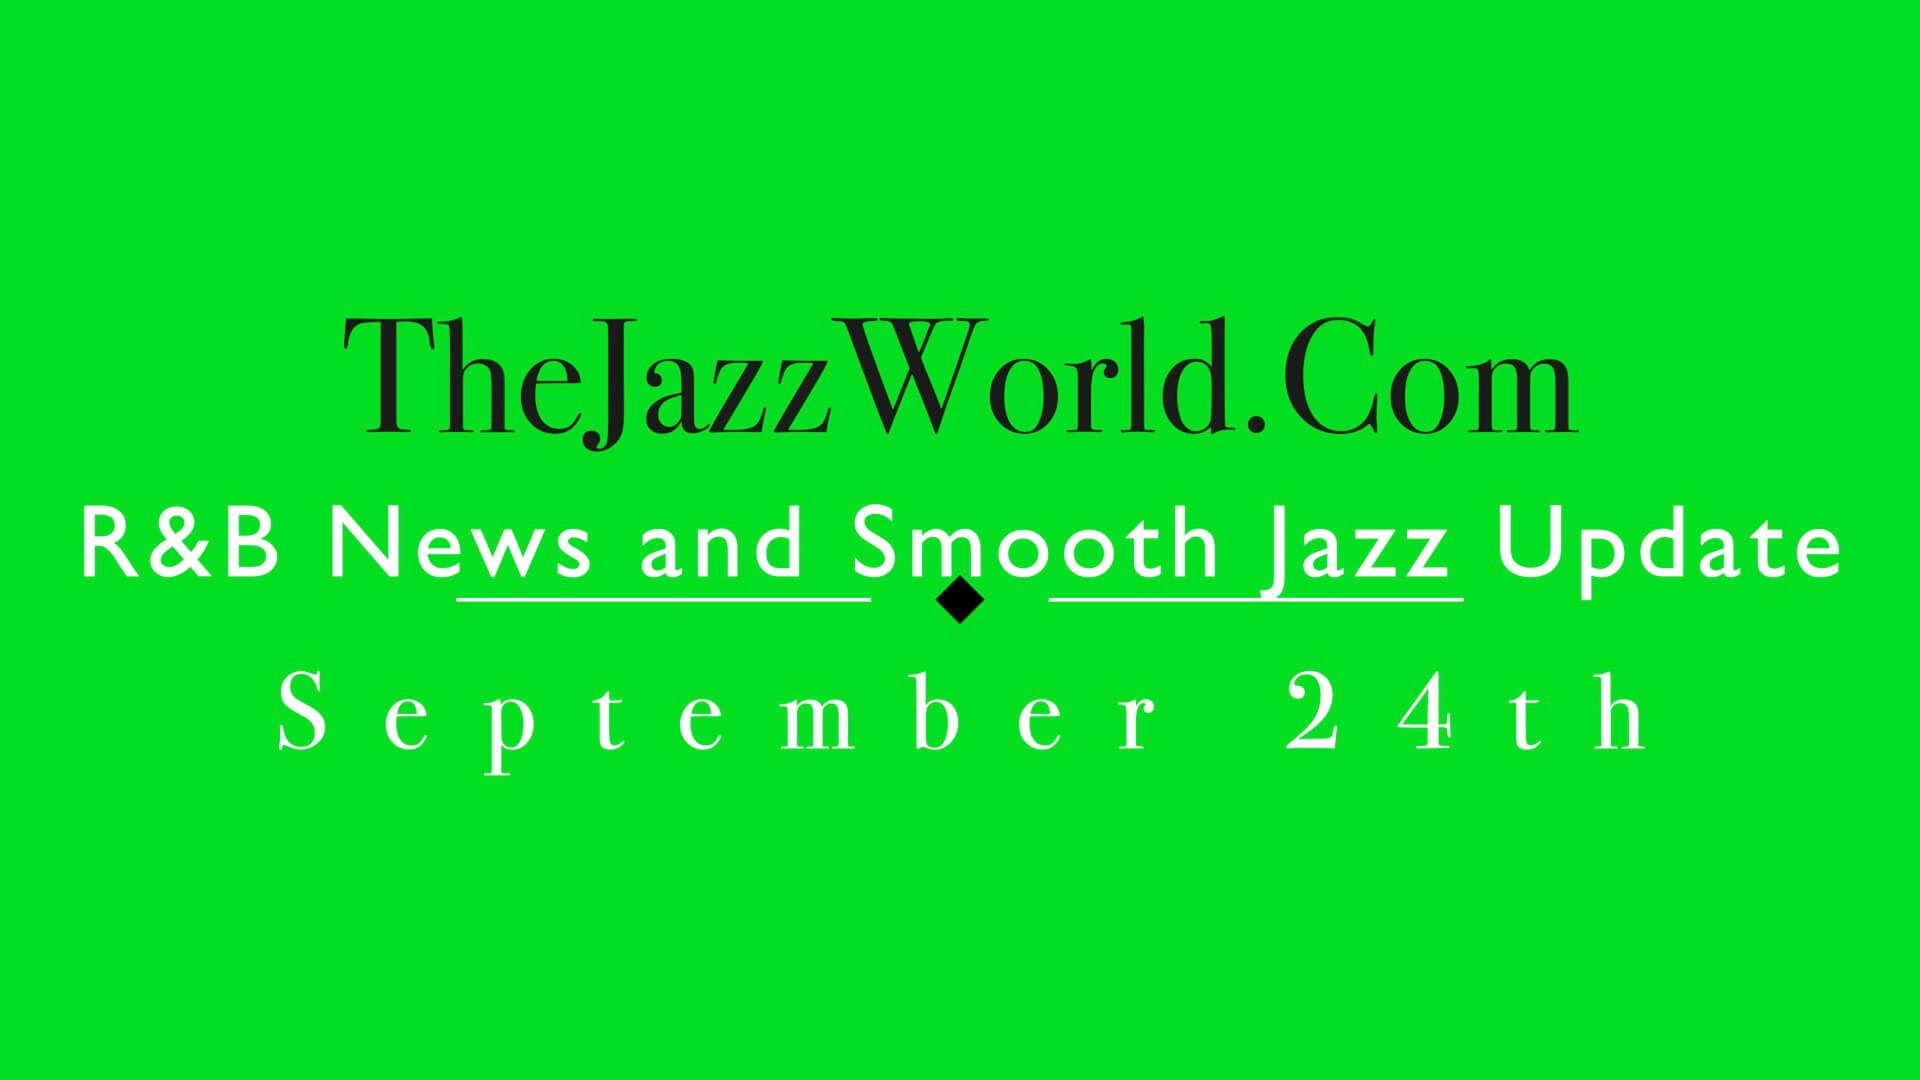 The Jazz World Show 9:24